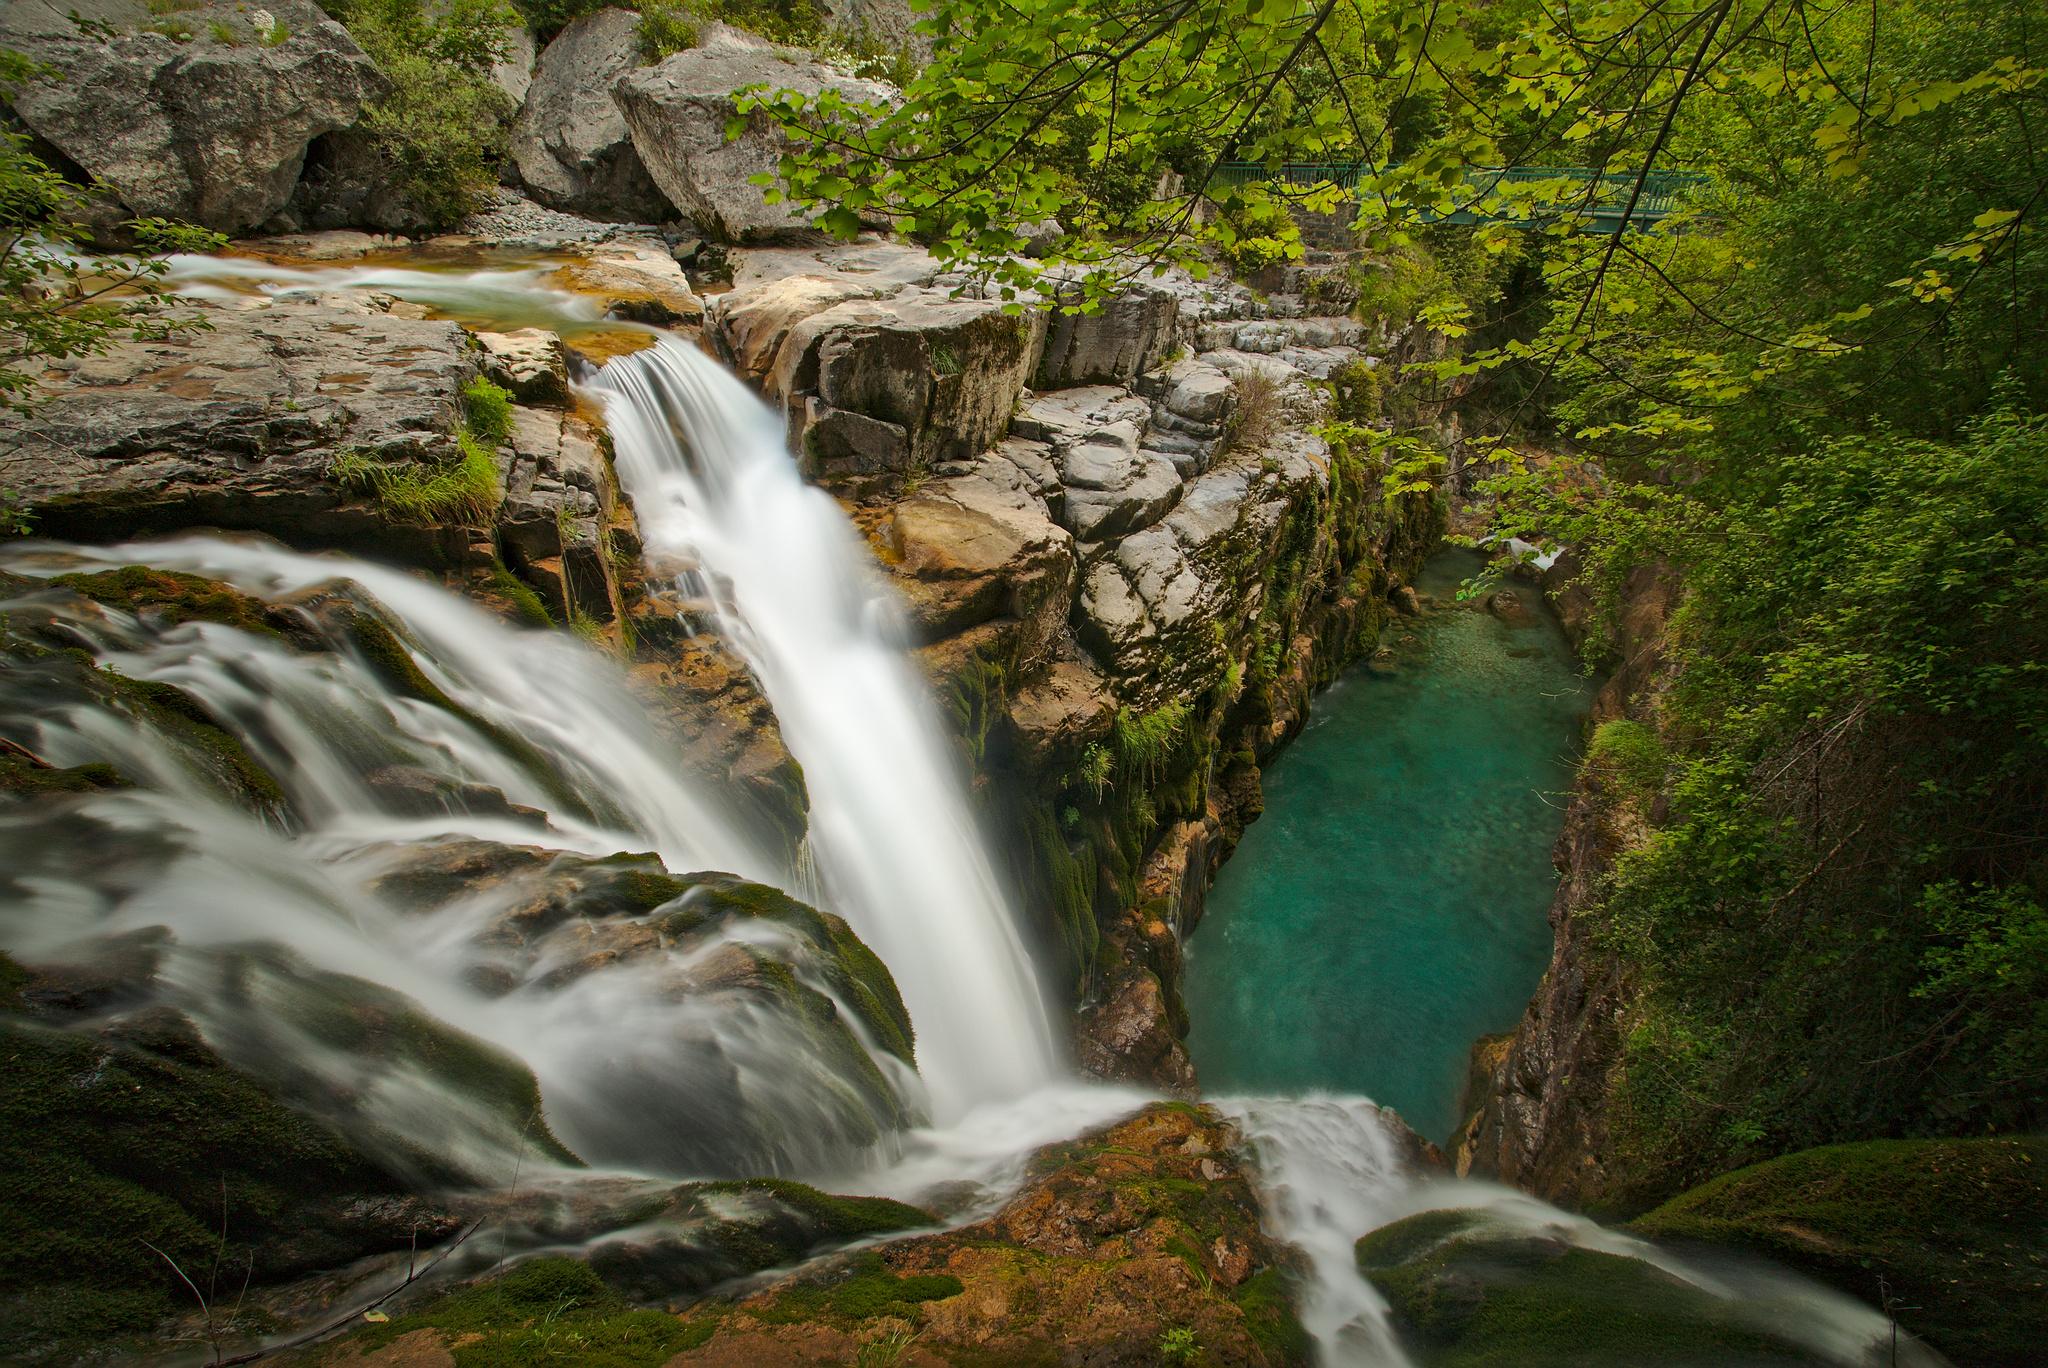 Anisclo canyon waterfalls, Spain